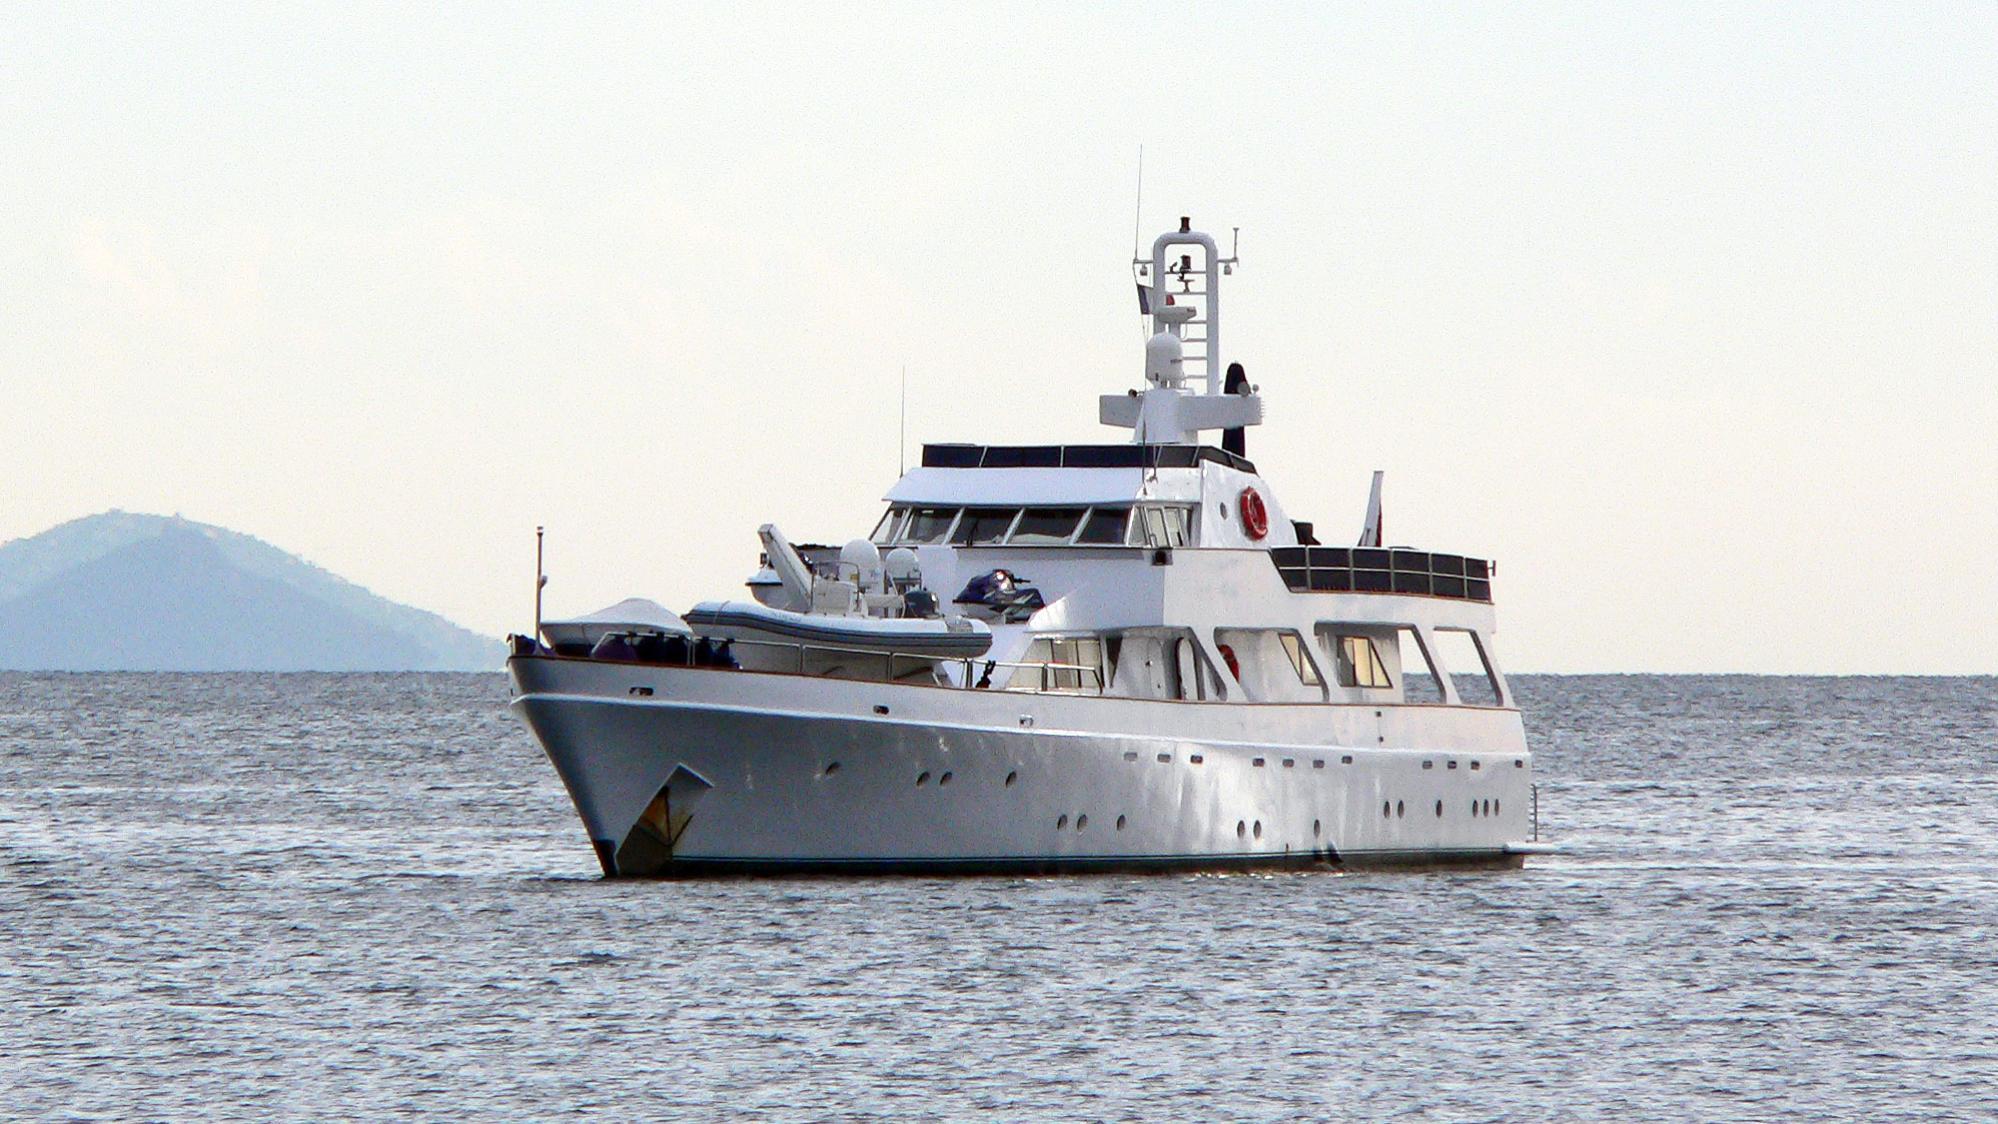 nomad-motor-yacht-proteksan-1977-32m-half-profile